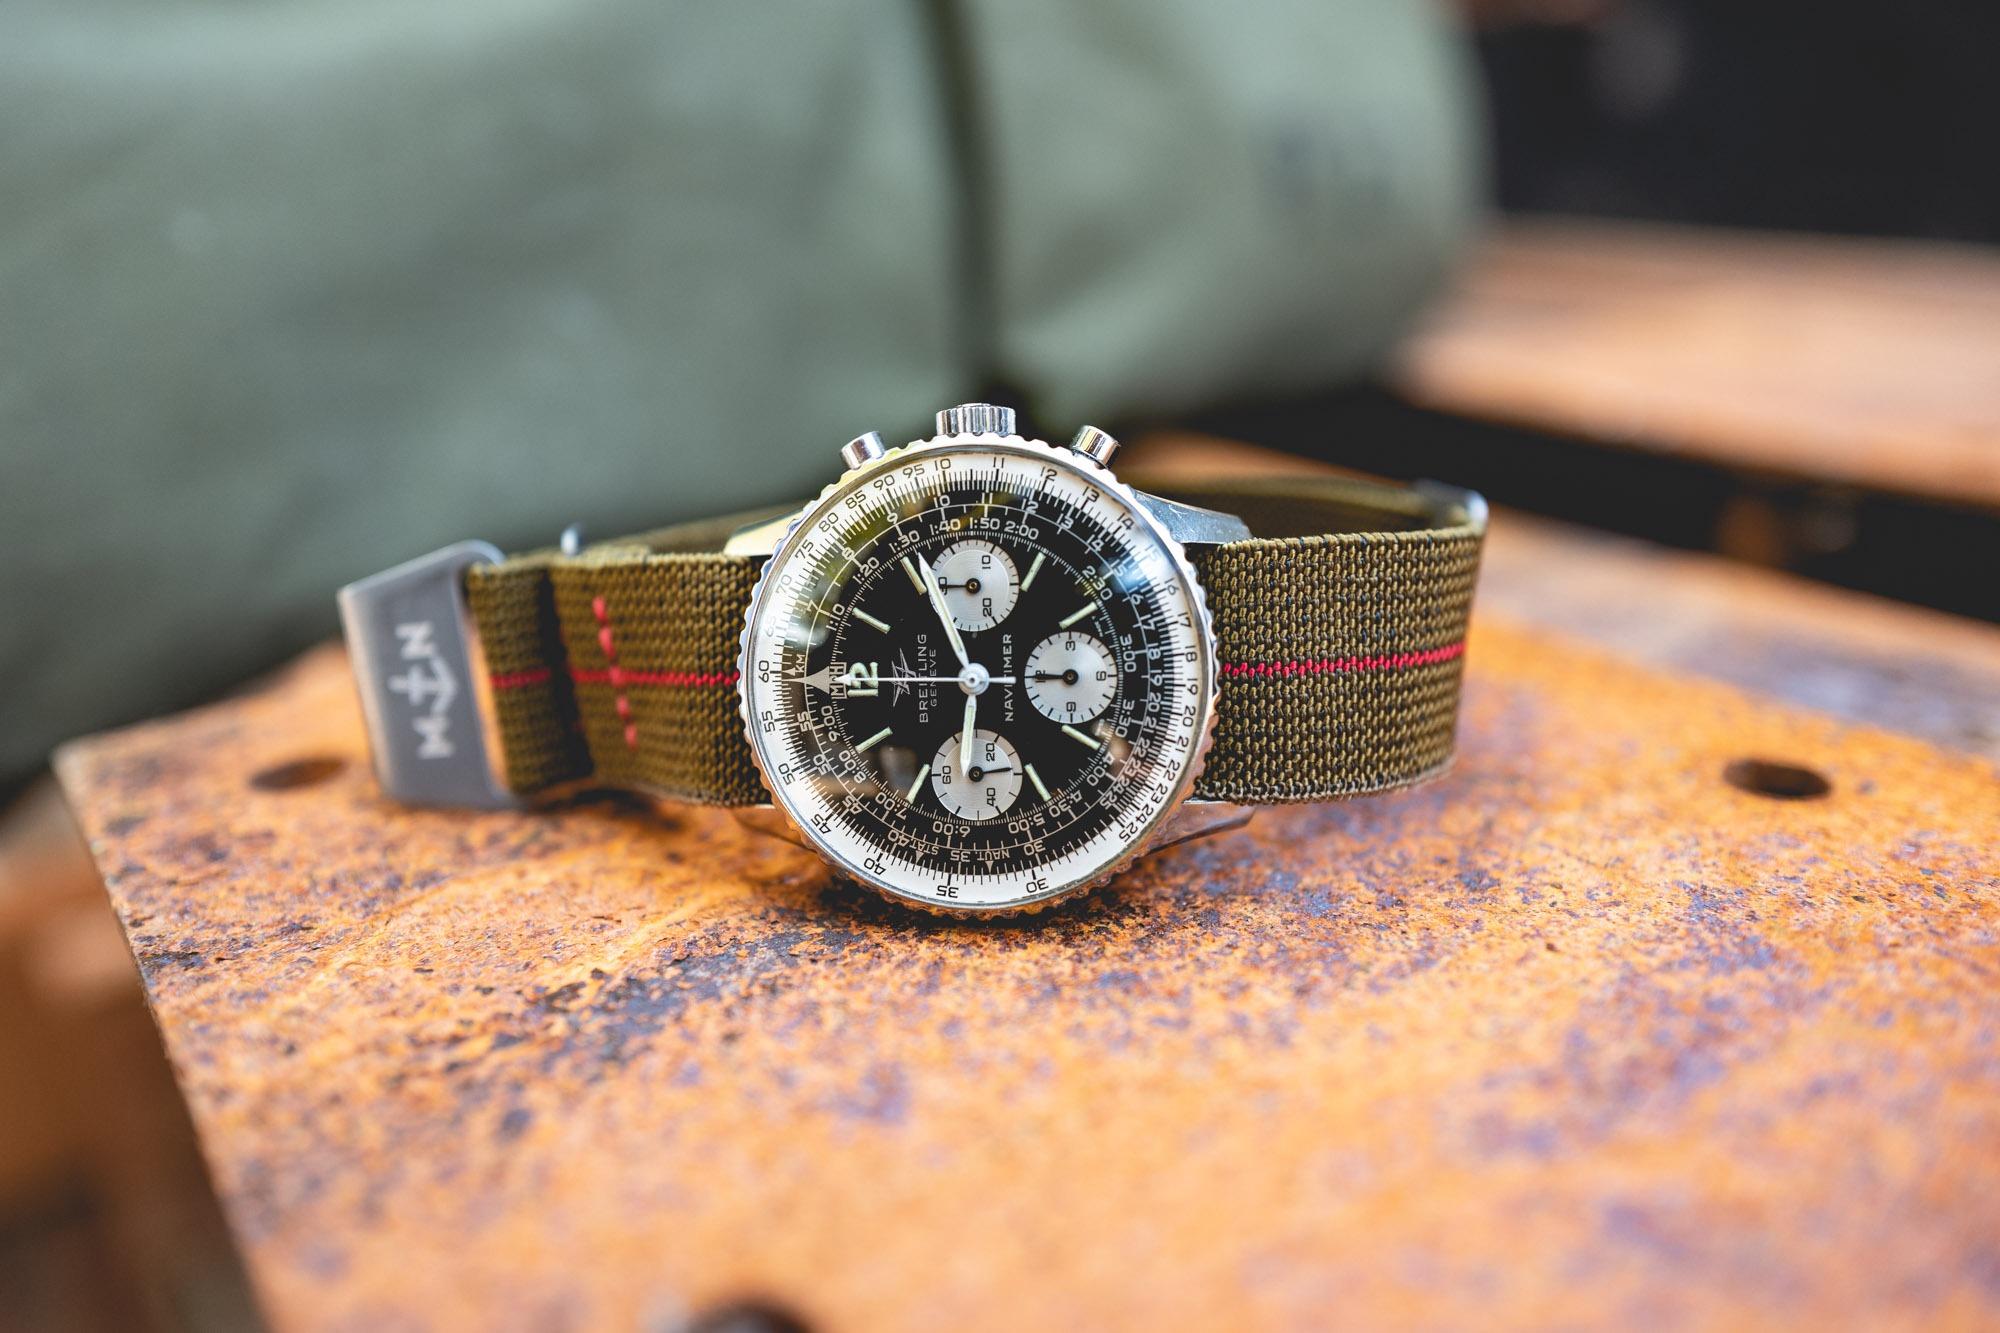 MN Straps - Bracelets Marine Nationale - Breitling Navitimer 806